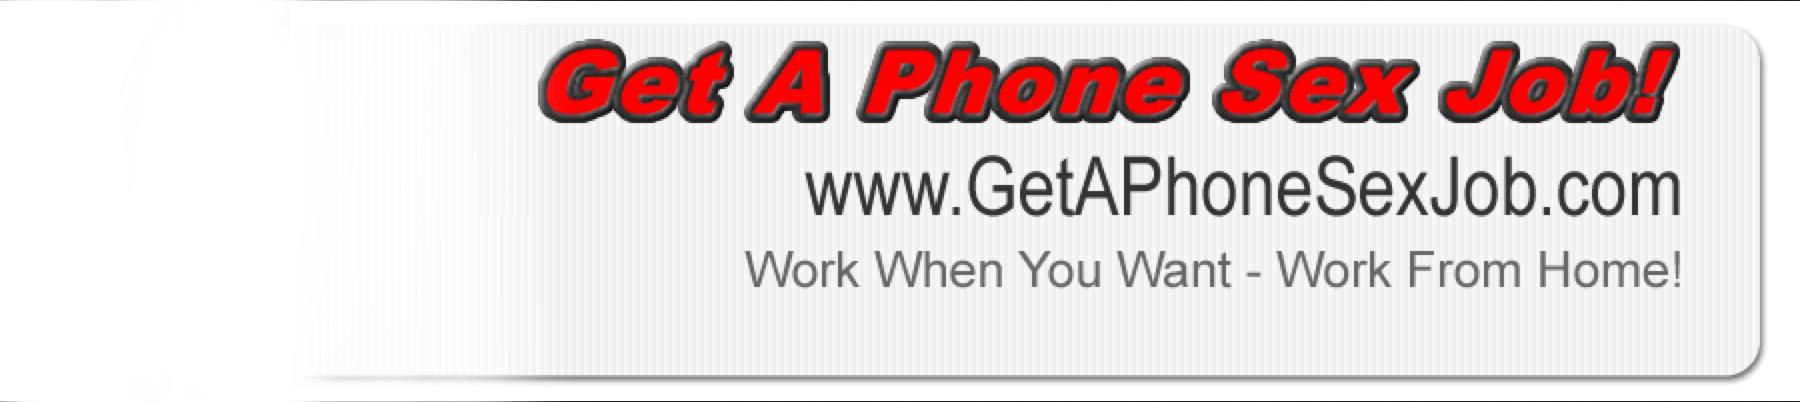 Get a Phone Sex Job